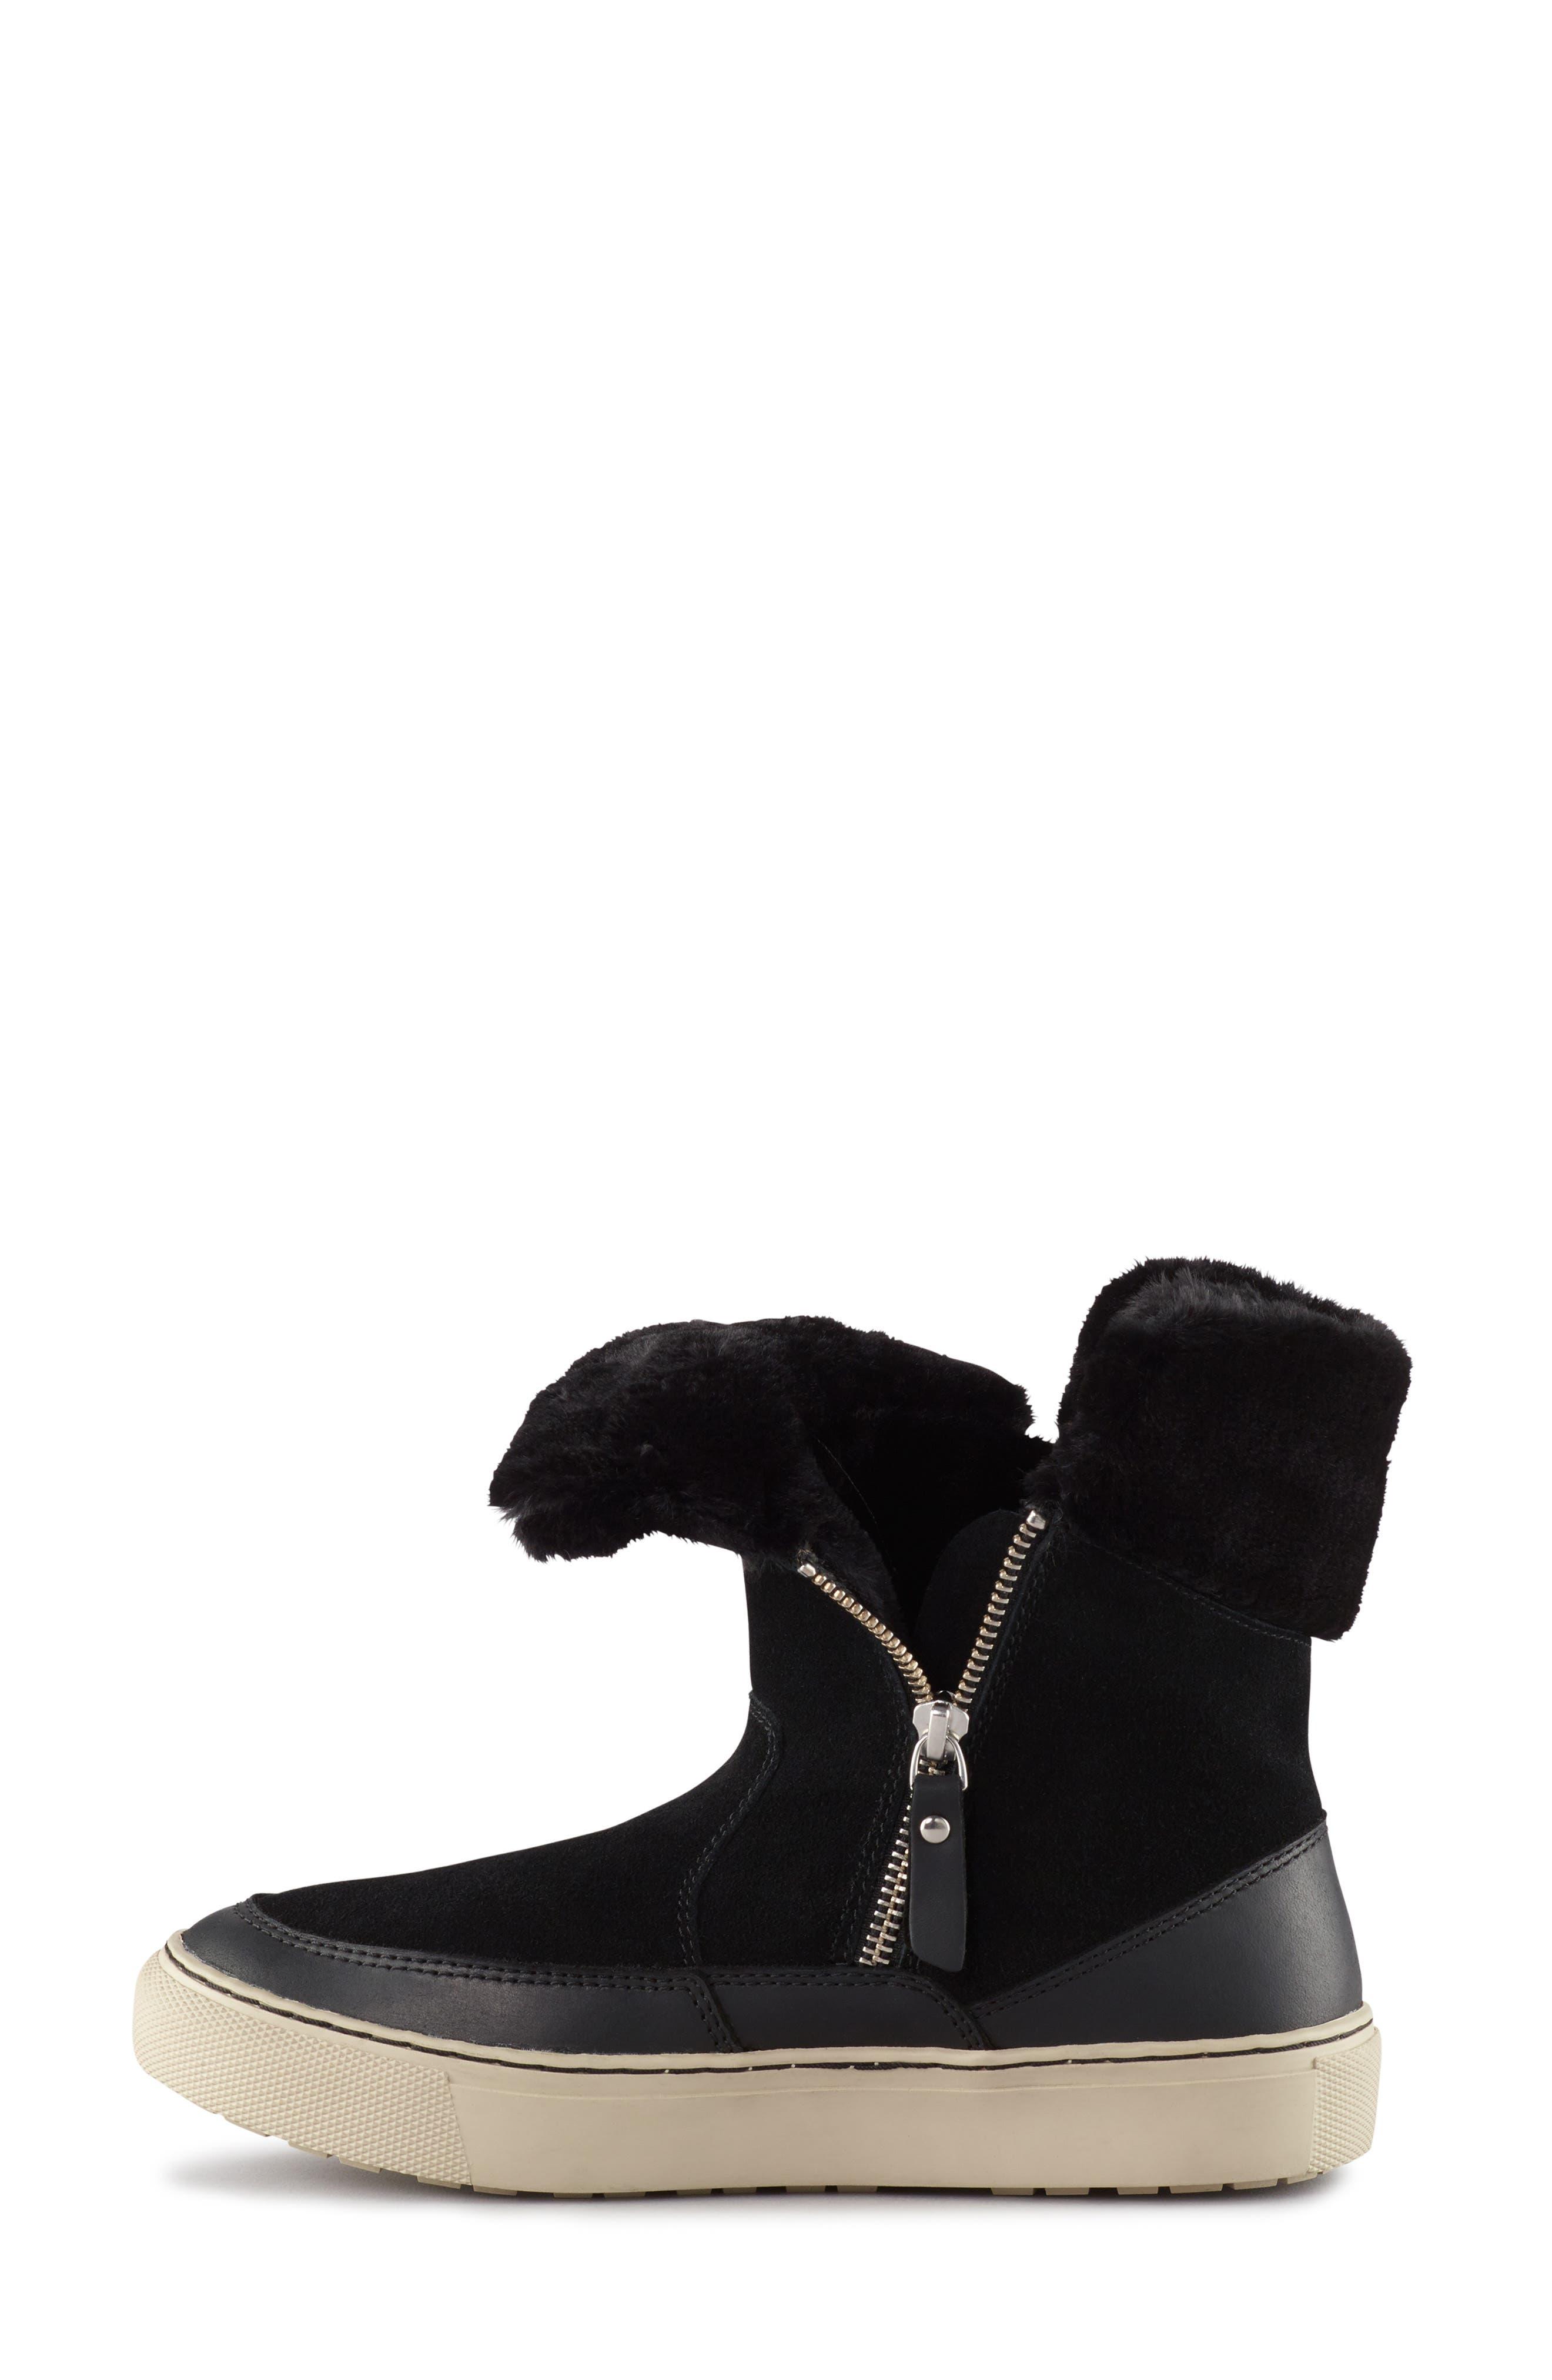 Dresden Waterproof Sneaker Boot with Faux Fur Trim,                             Alternate thumbnail 6, color,                             001